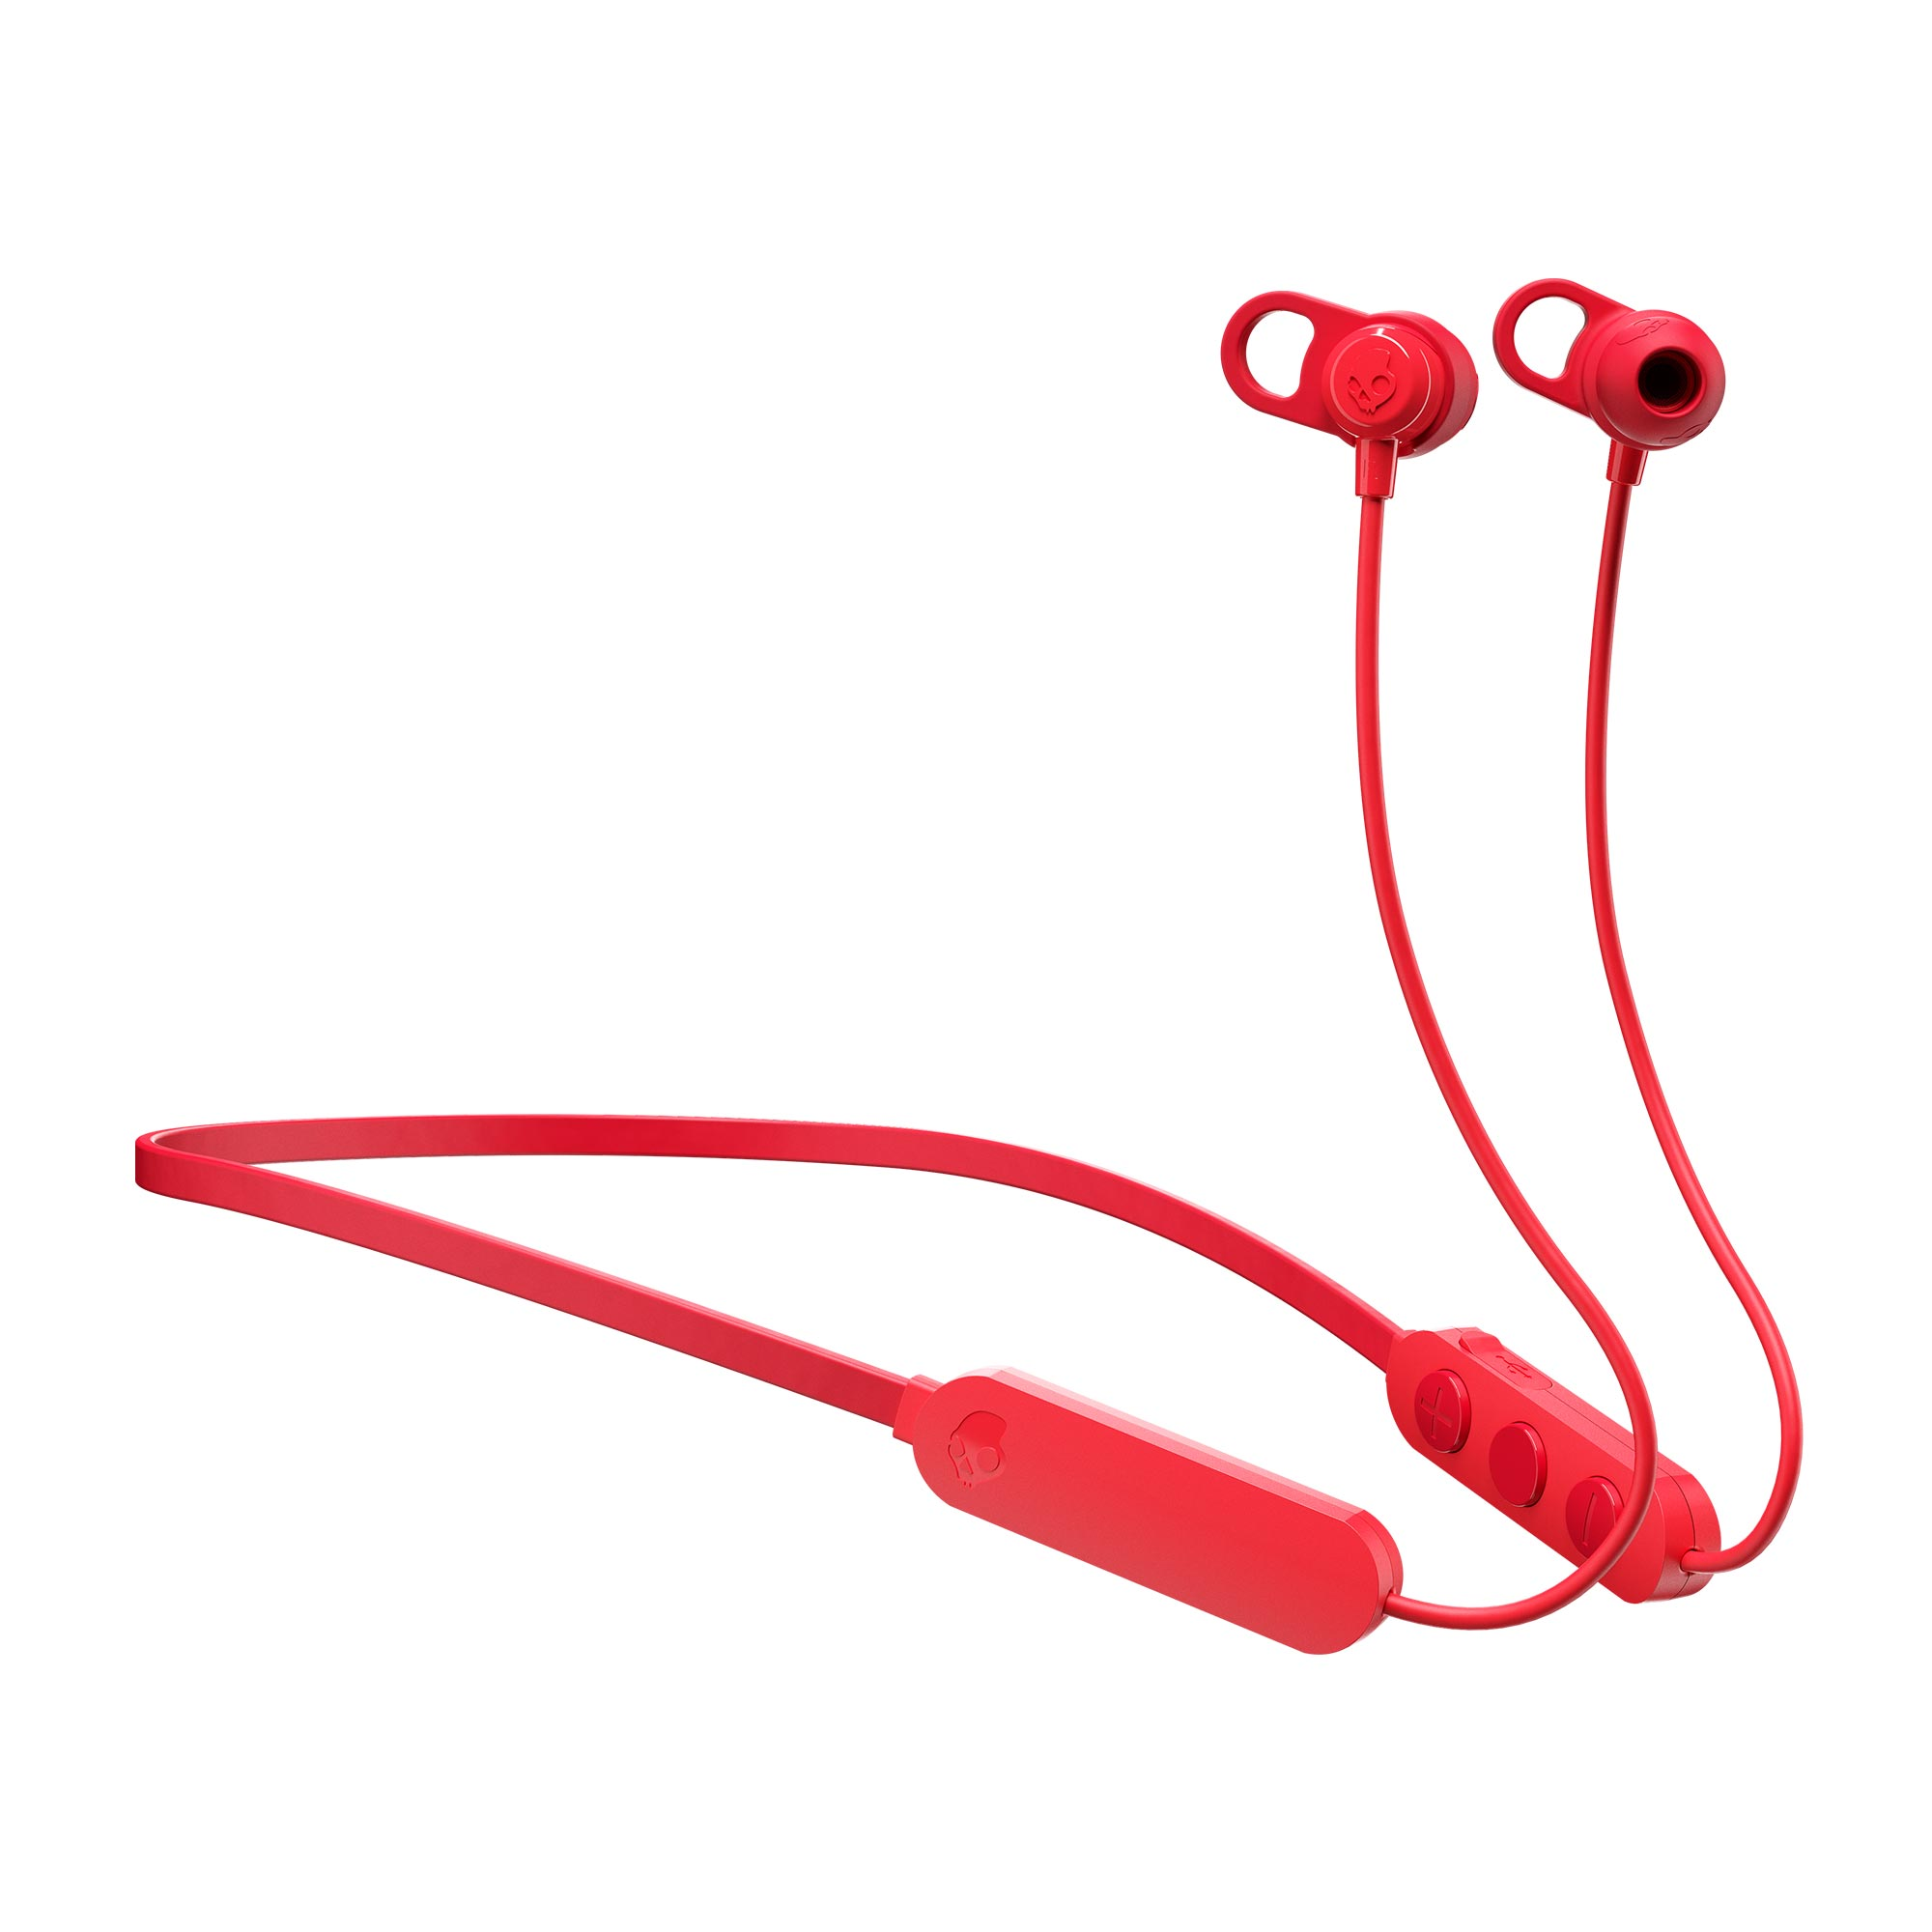 Skullcandy Jib™+ Wireless Earbuds (Cherry Red) for $18